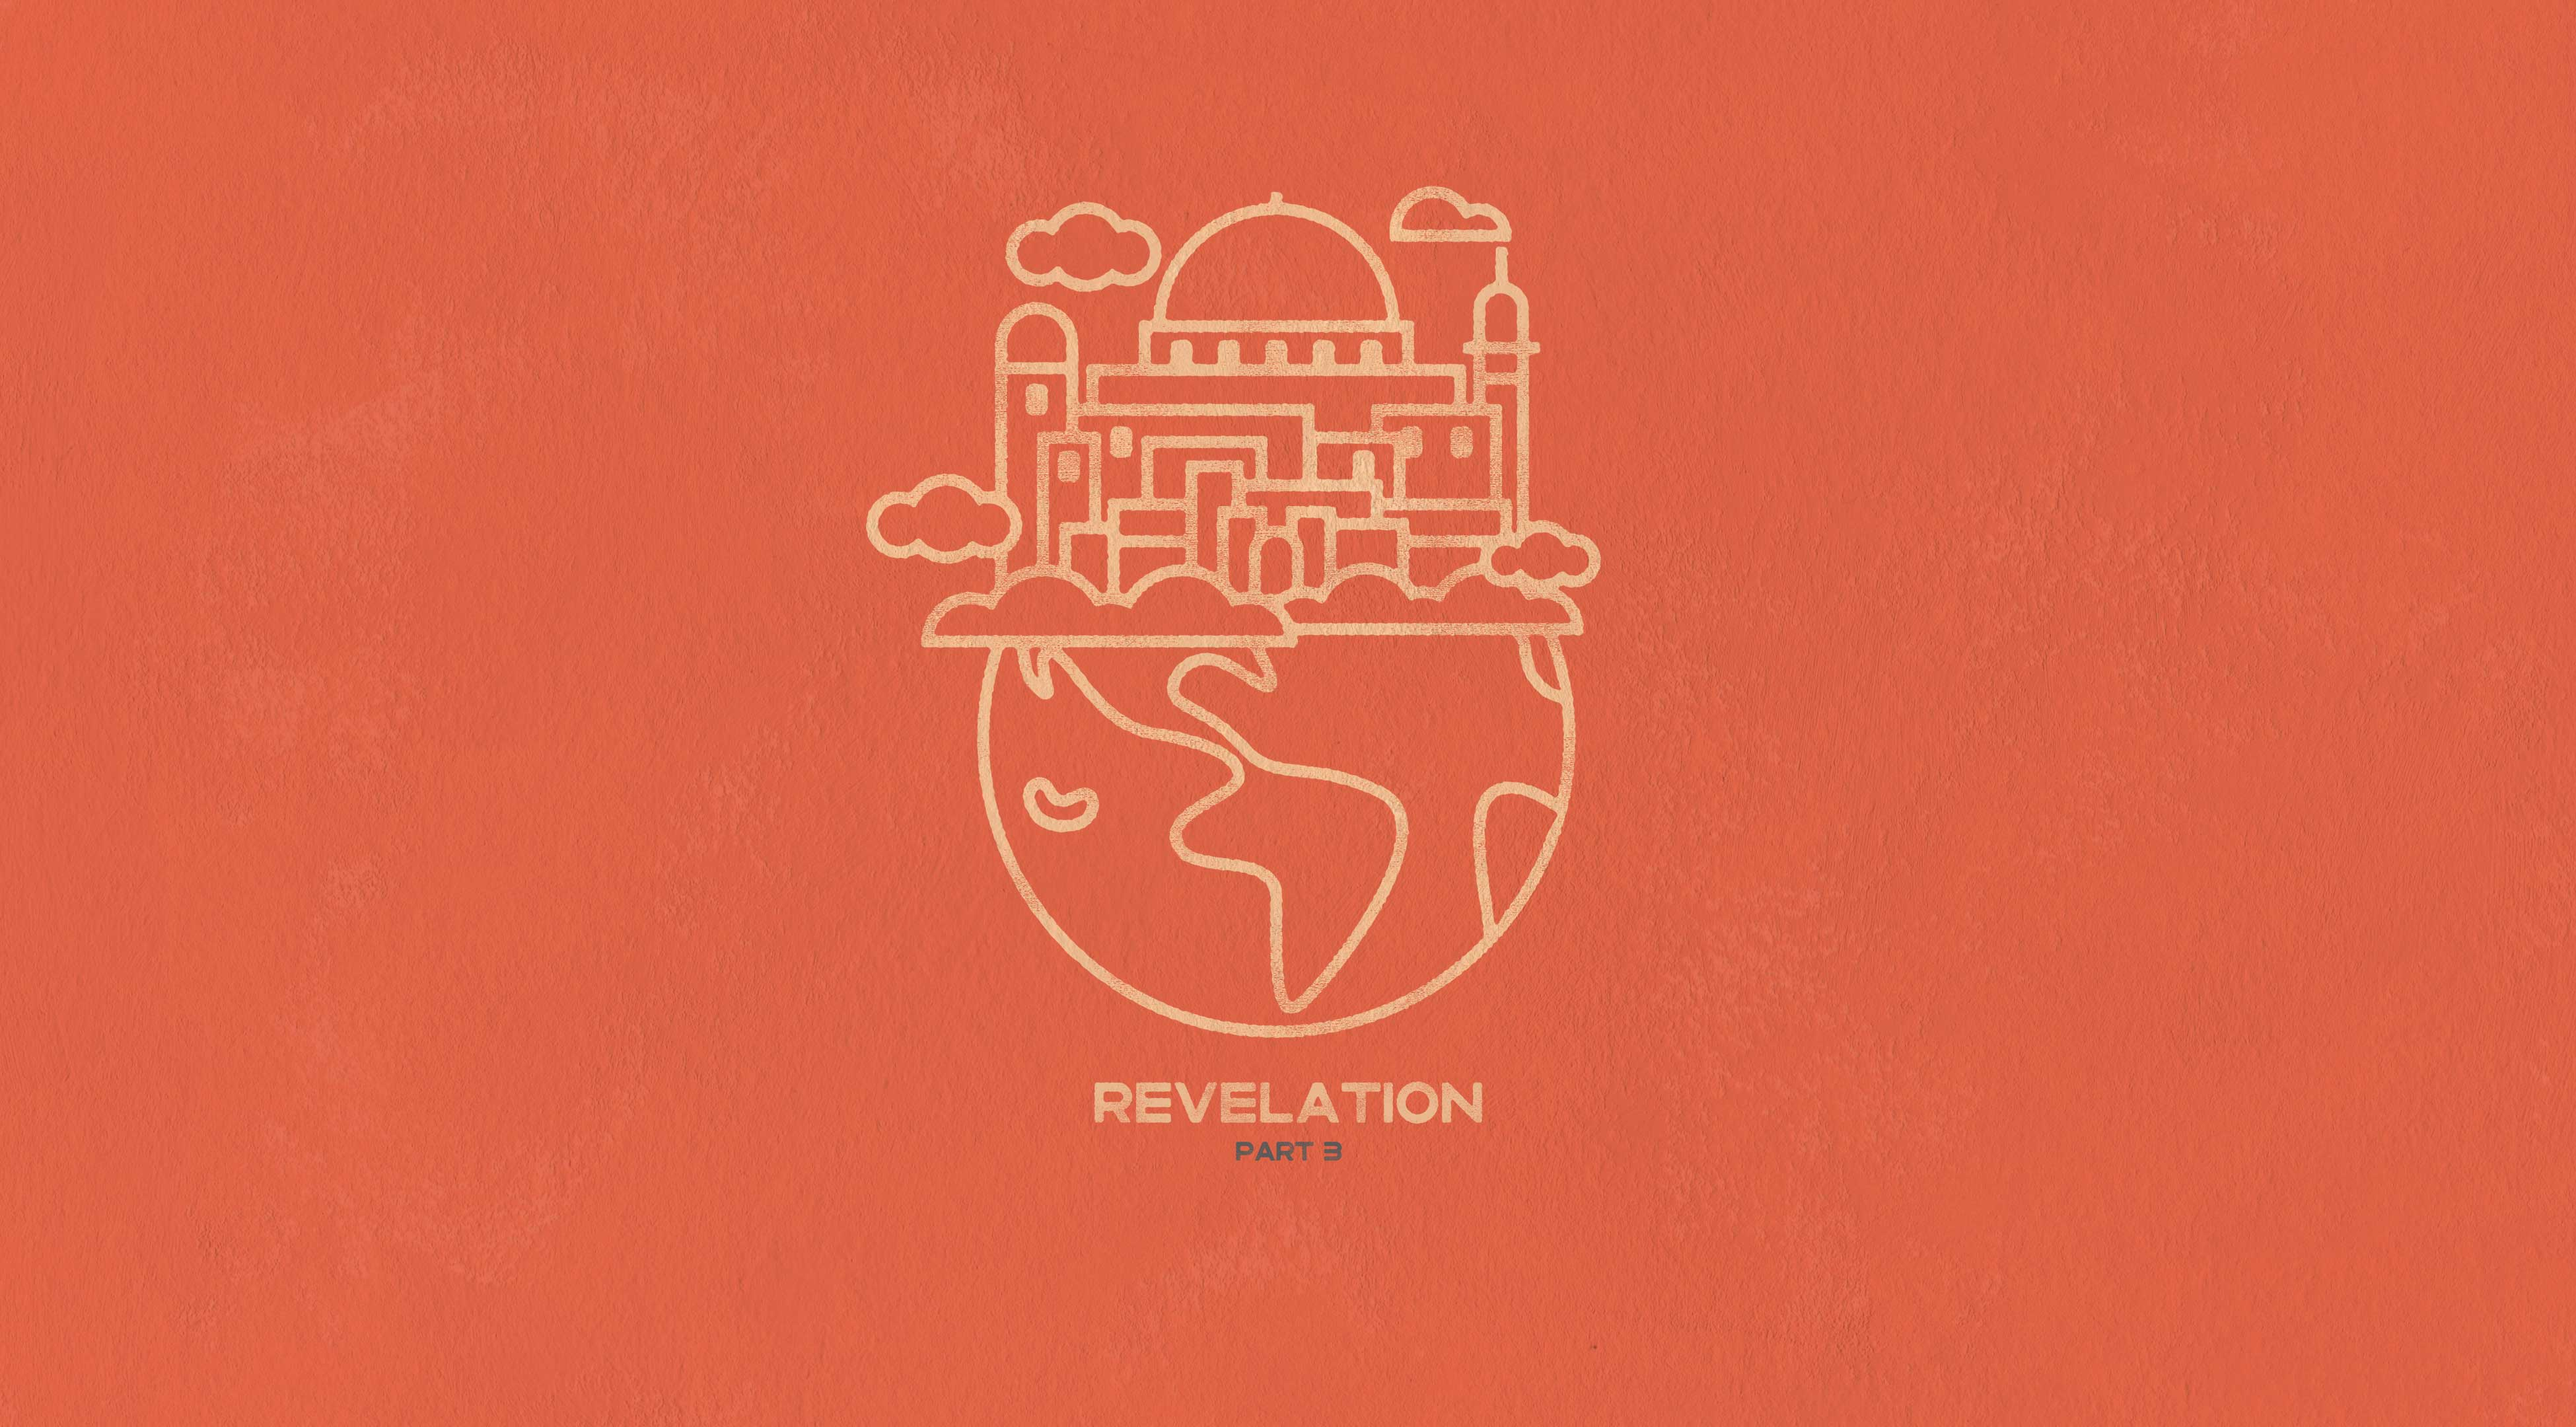 Powerpoint_RevelationPart3